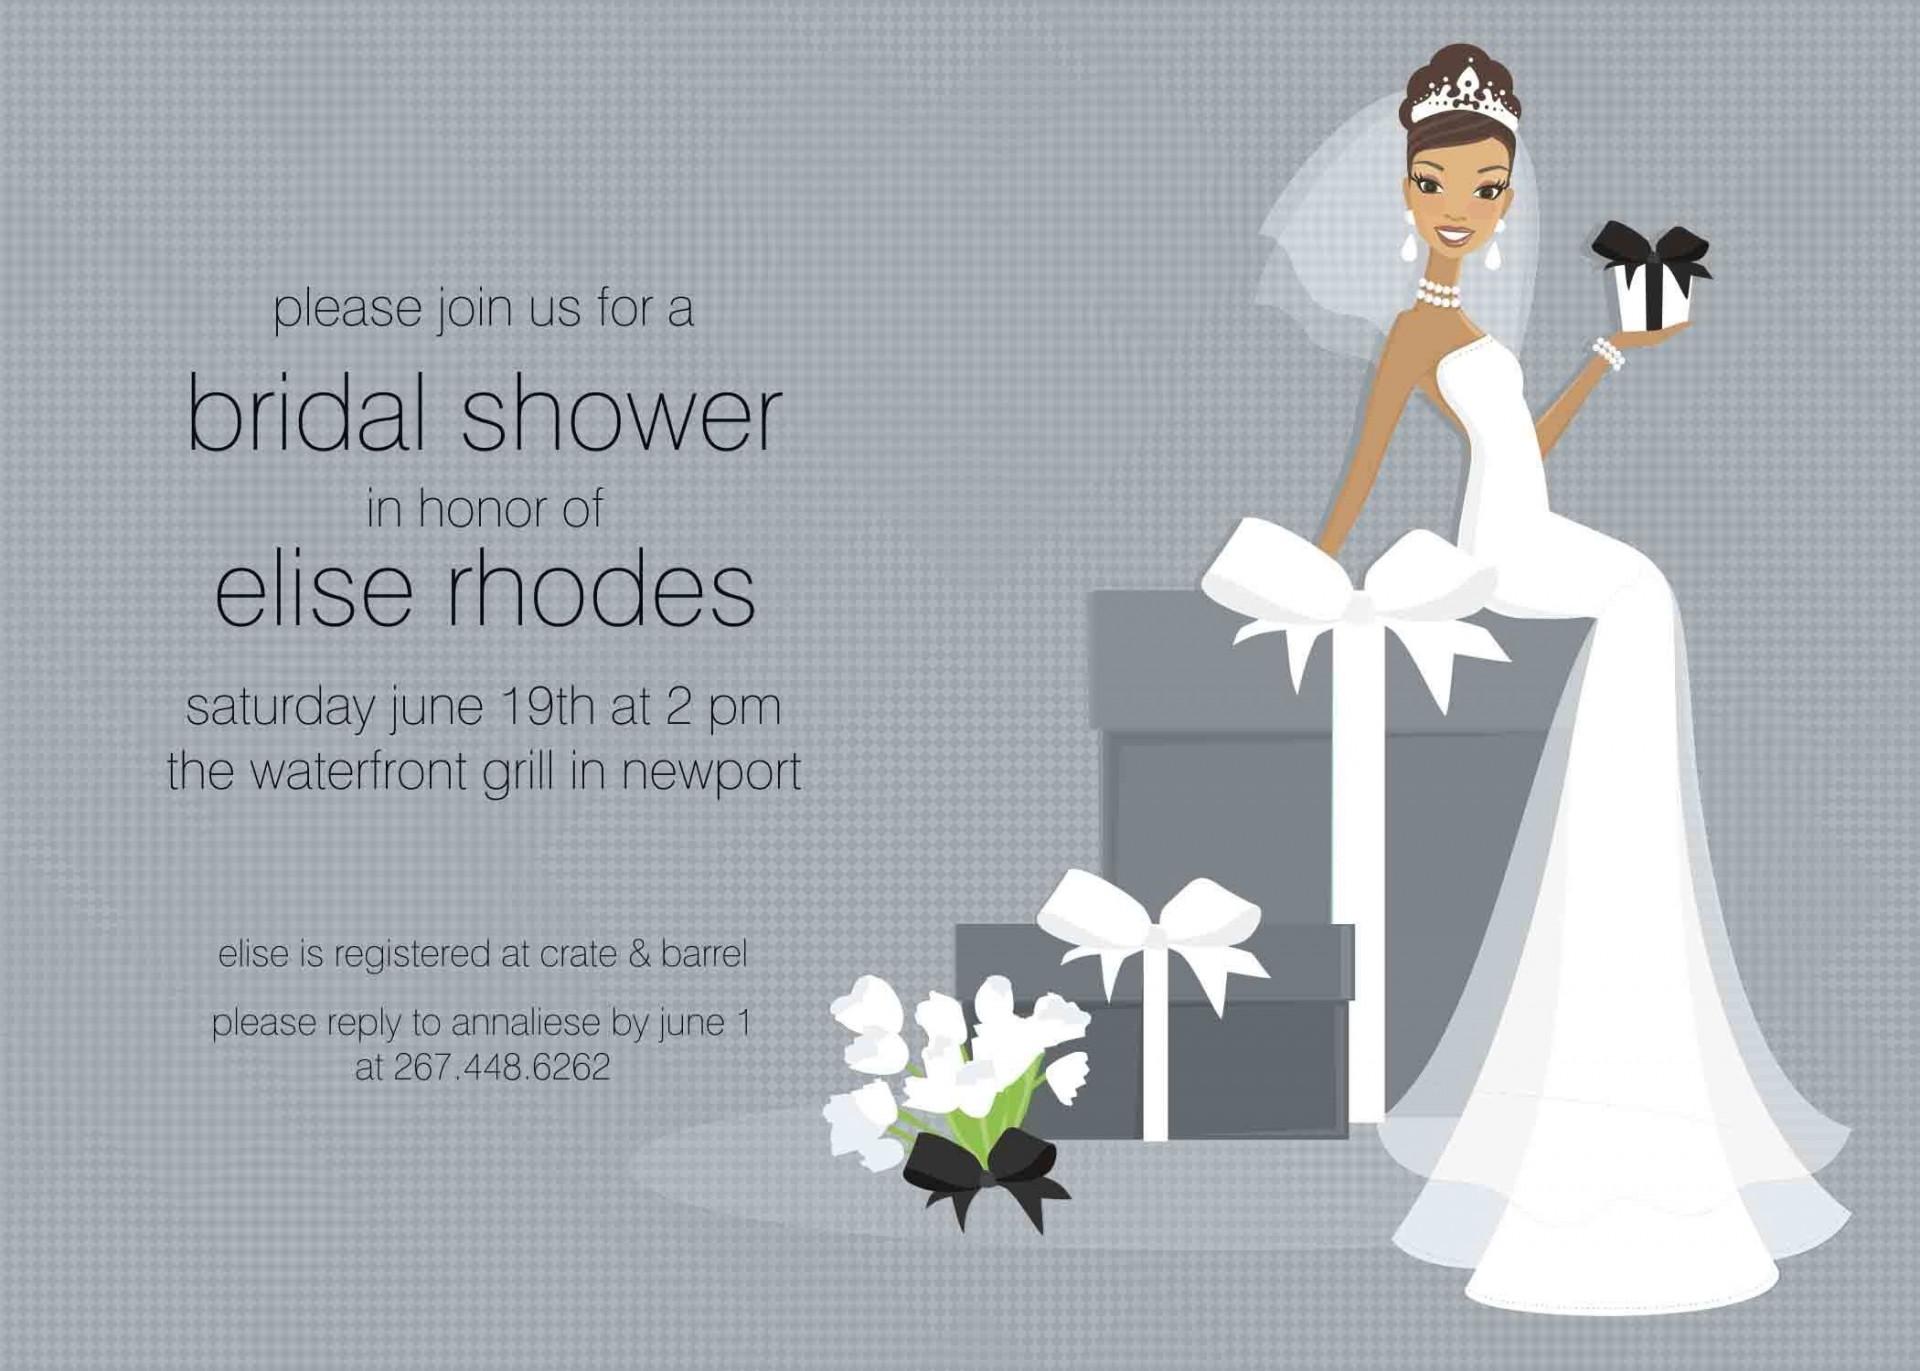 006 Frightening Free Bridal Shower Invite Template Design  Invitation For Word Wedding Microsoft1920